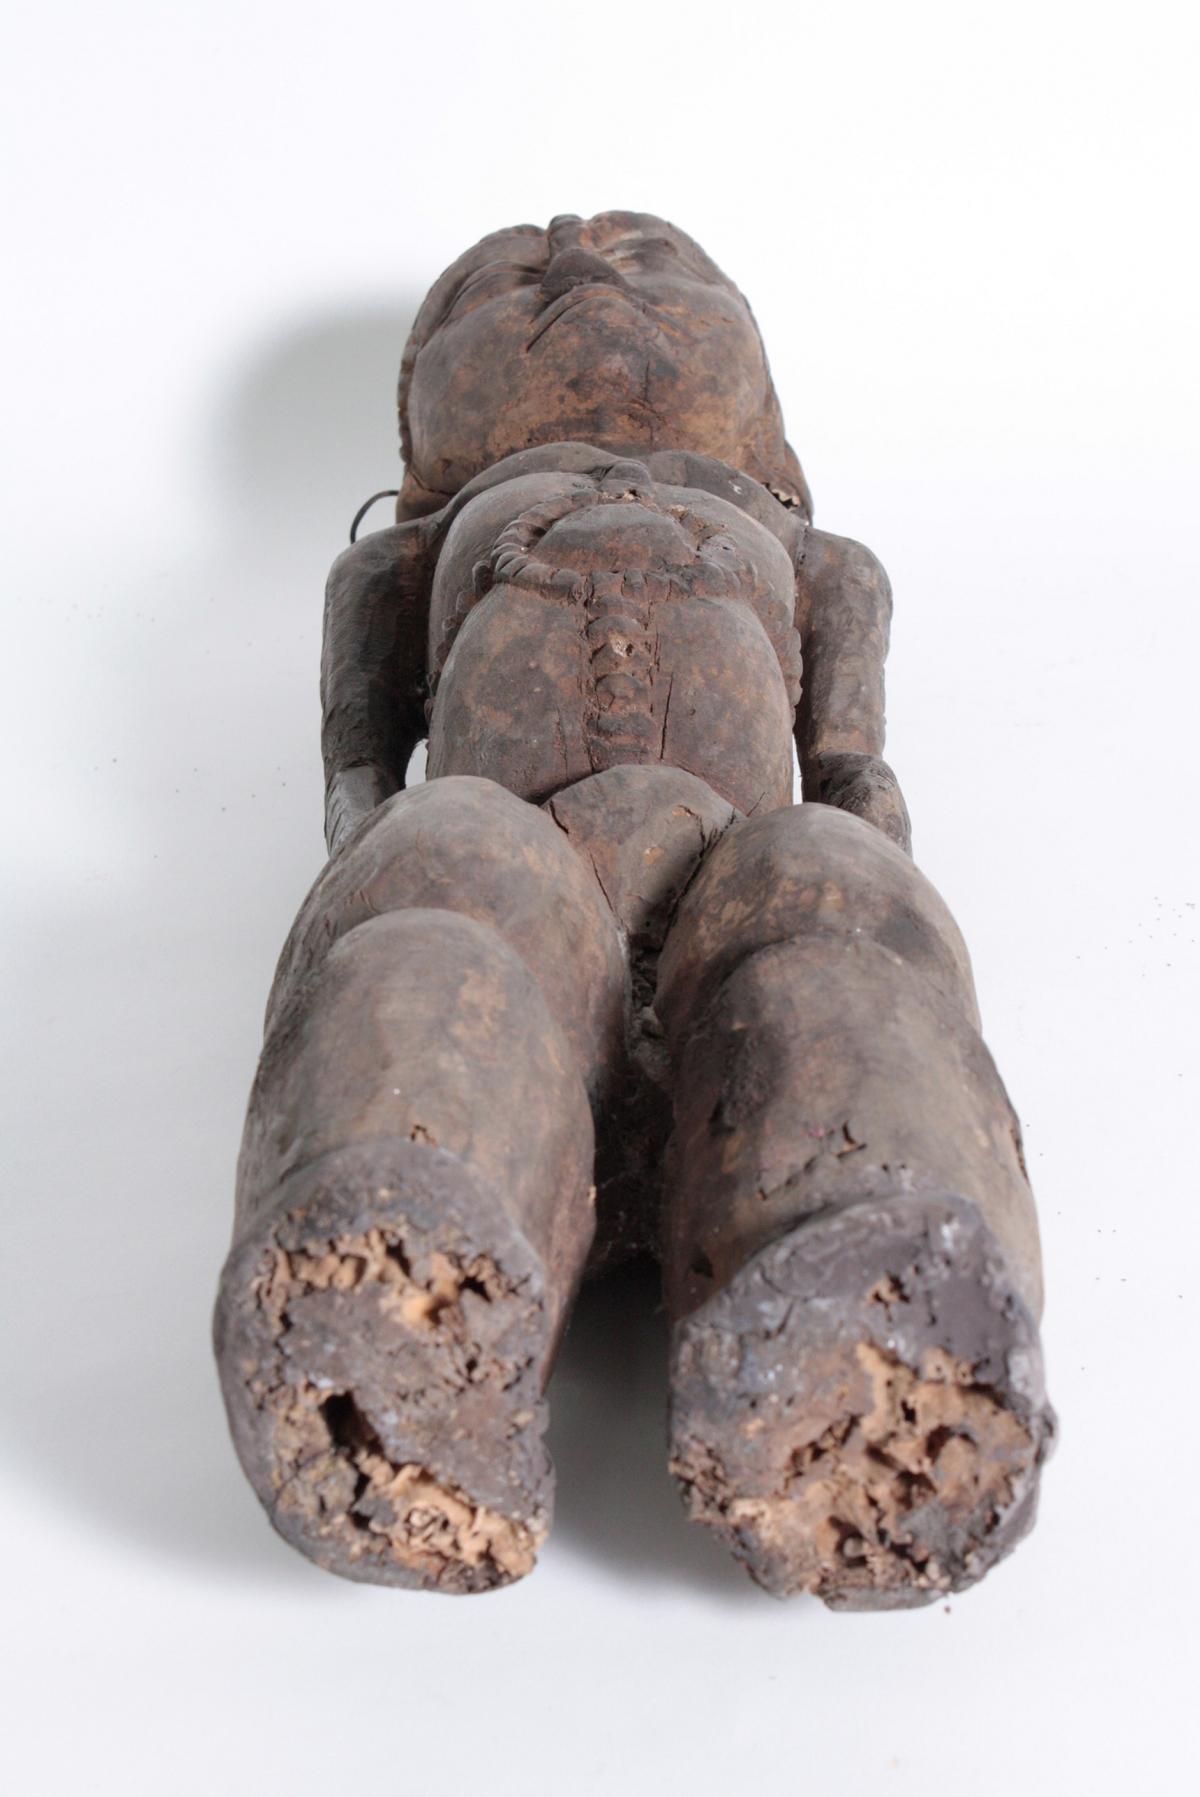 Ältere Ahnen-Figur, Tabwa, D. R. Kongo-12